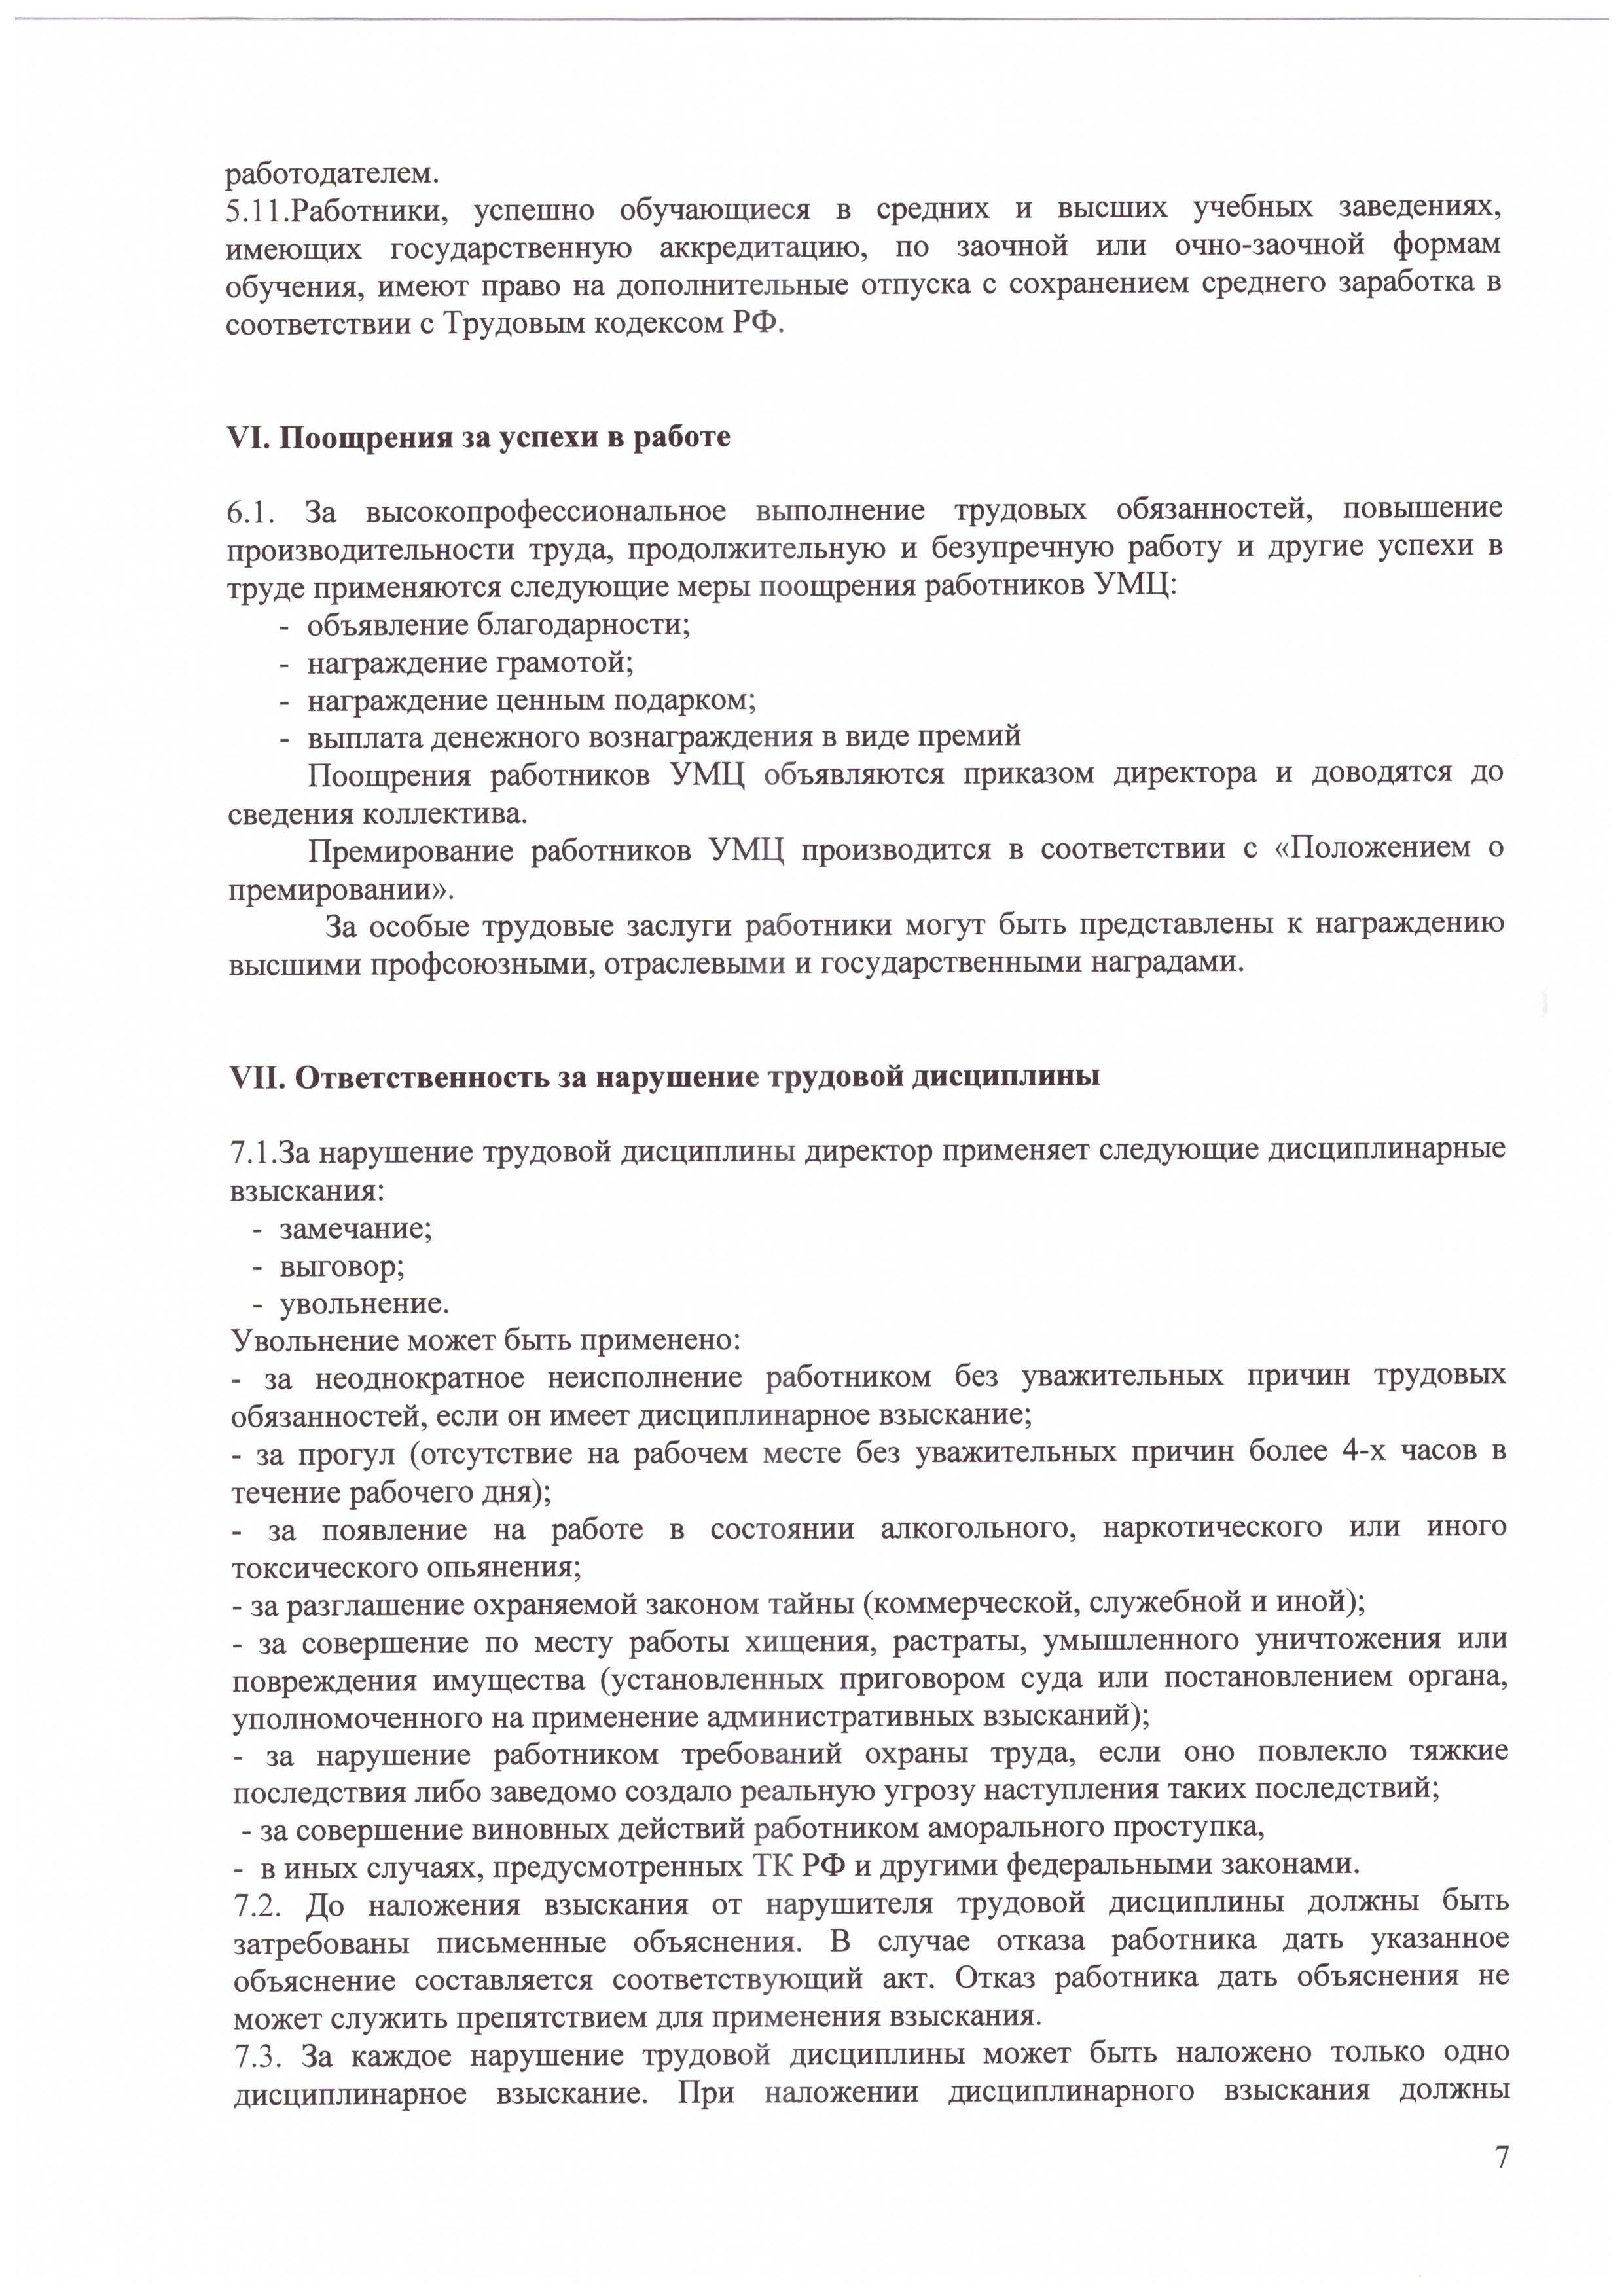 SCAN_правила внутр.распор_Страница_7